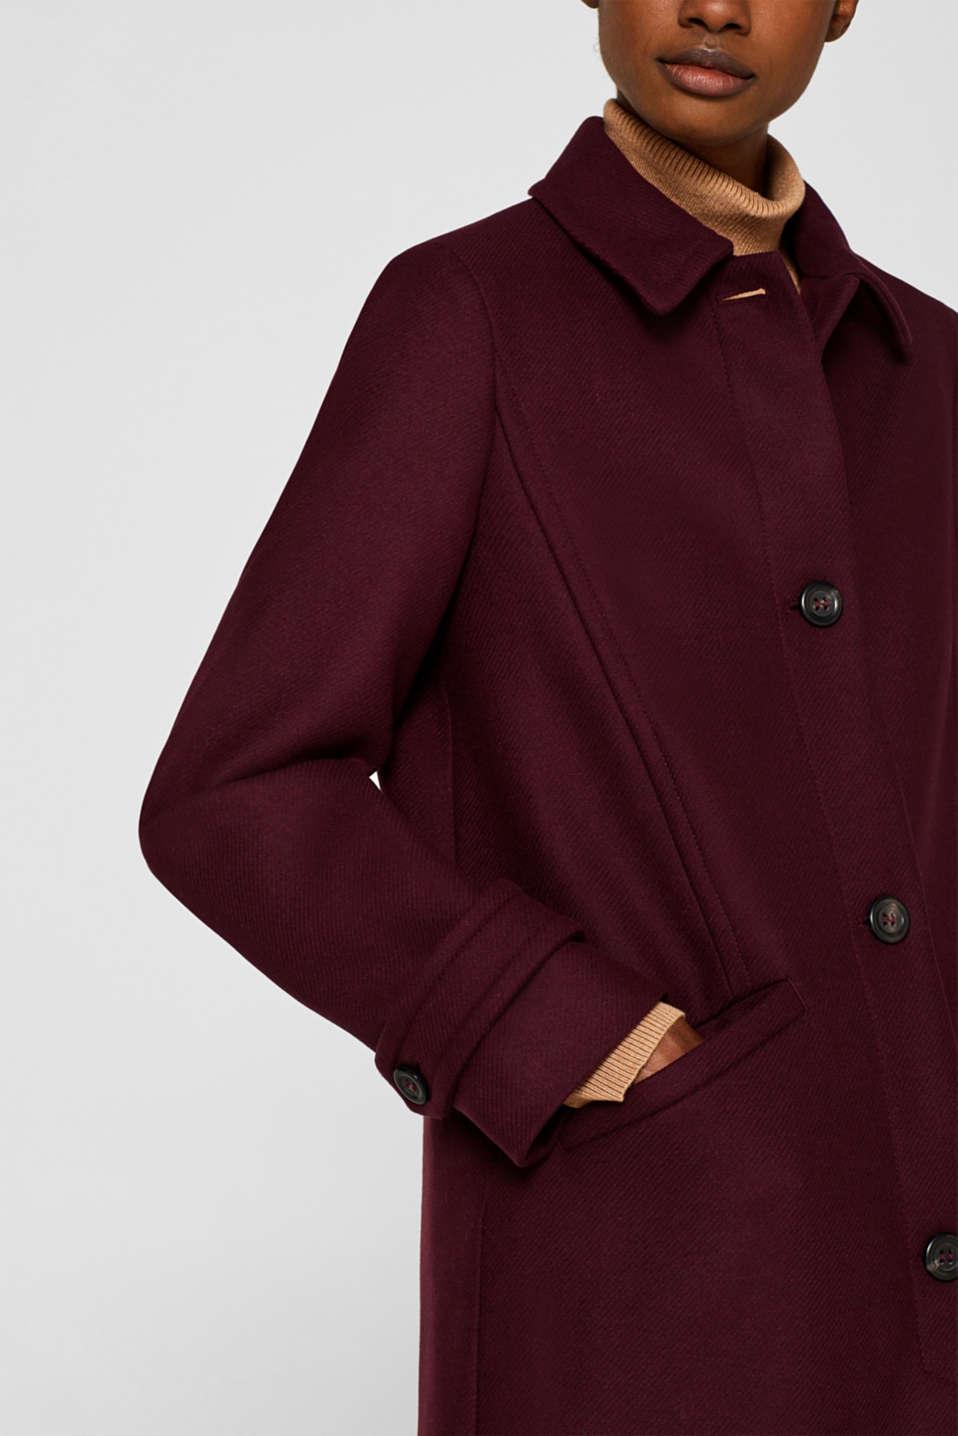 Wool blend coat, BORDEAUX RED, detail image number 2